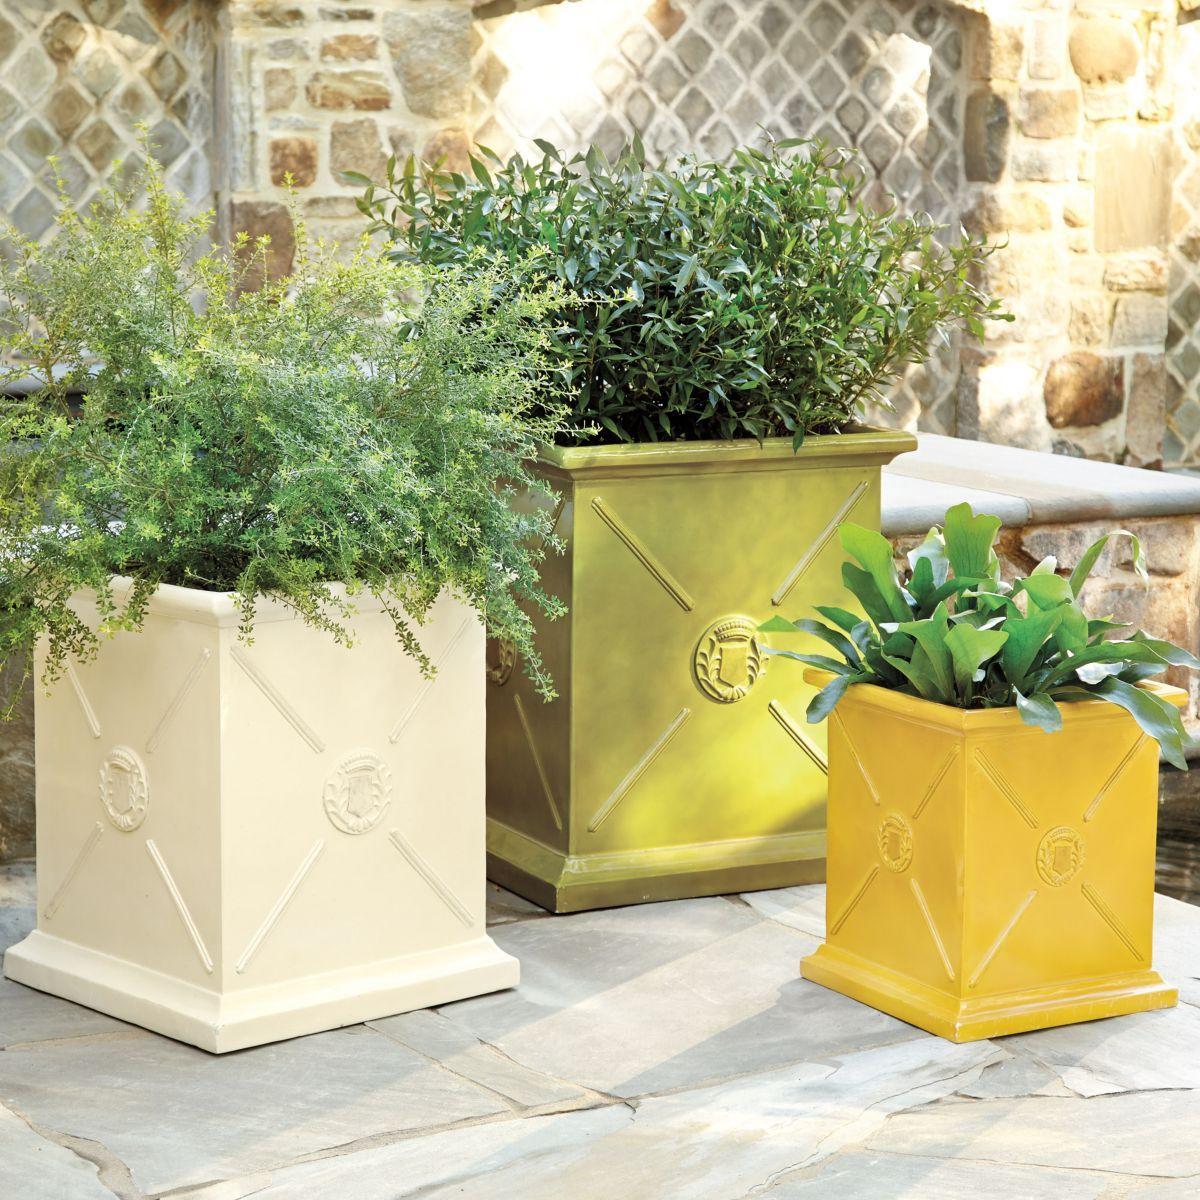 Ballard Designs Colorful Planter